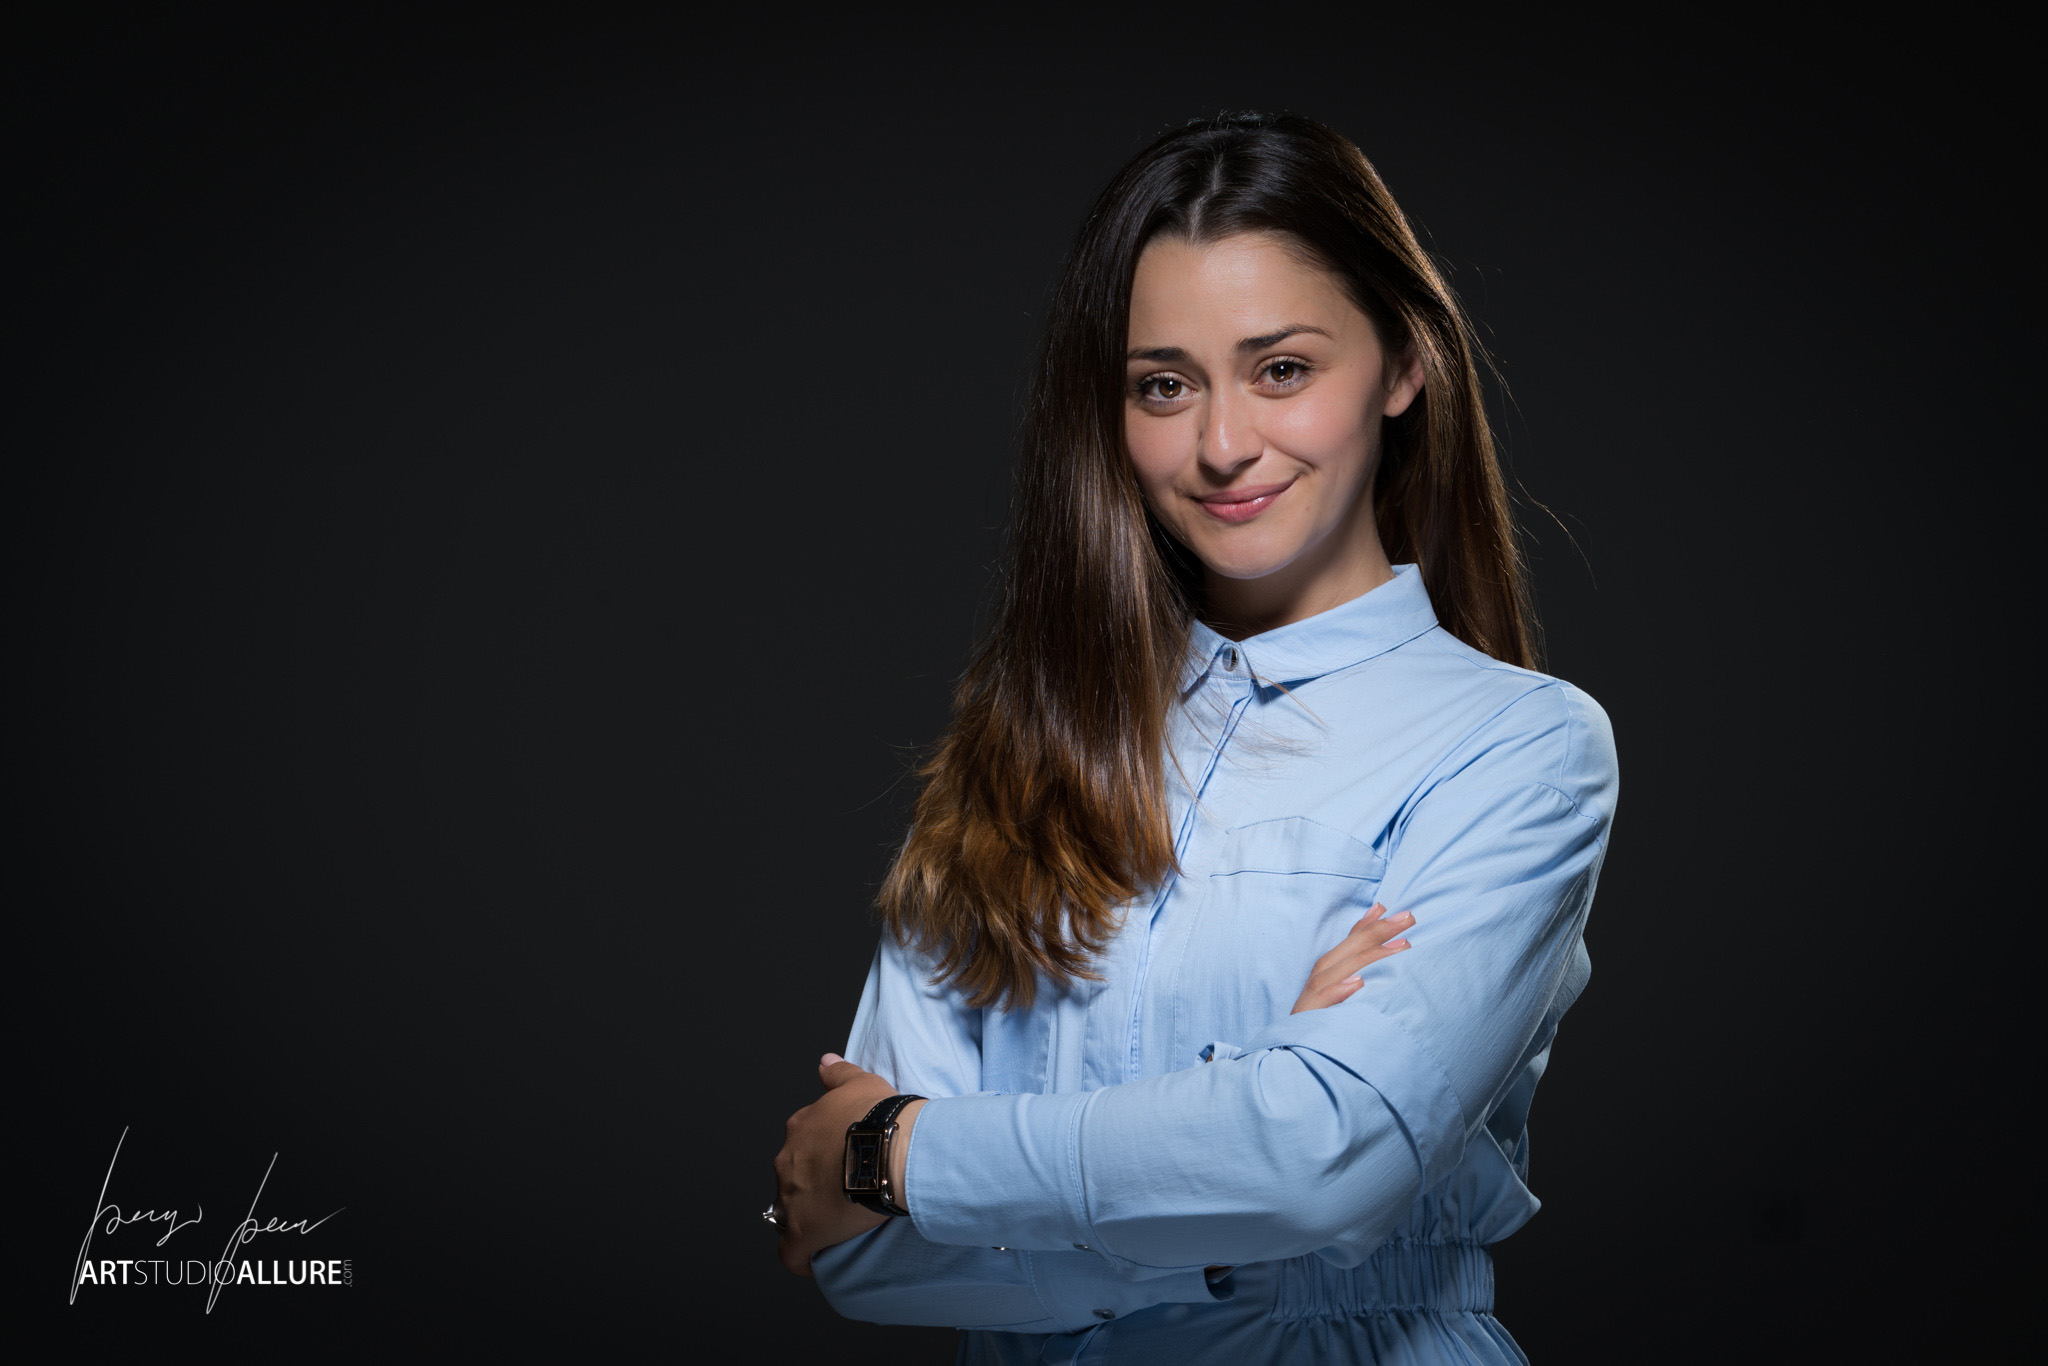 Totka Minkova